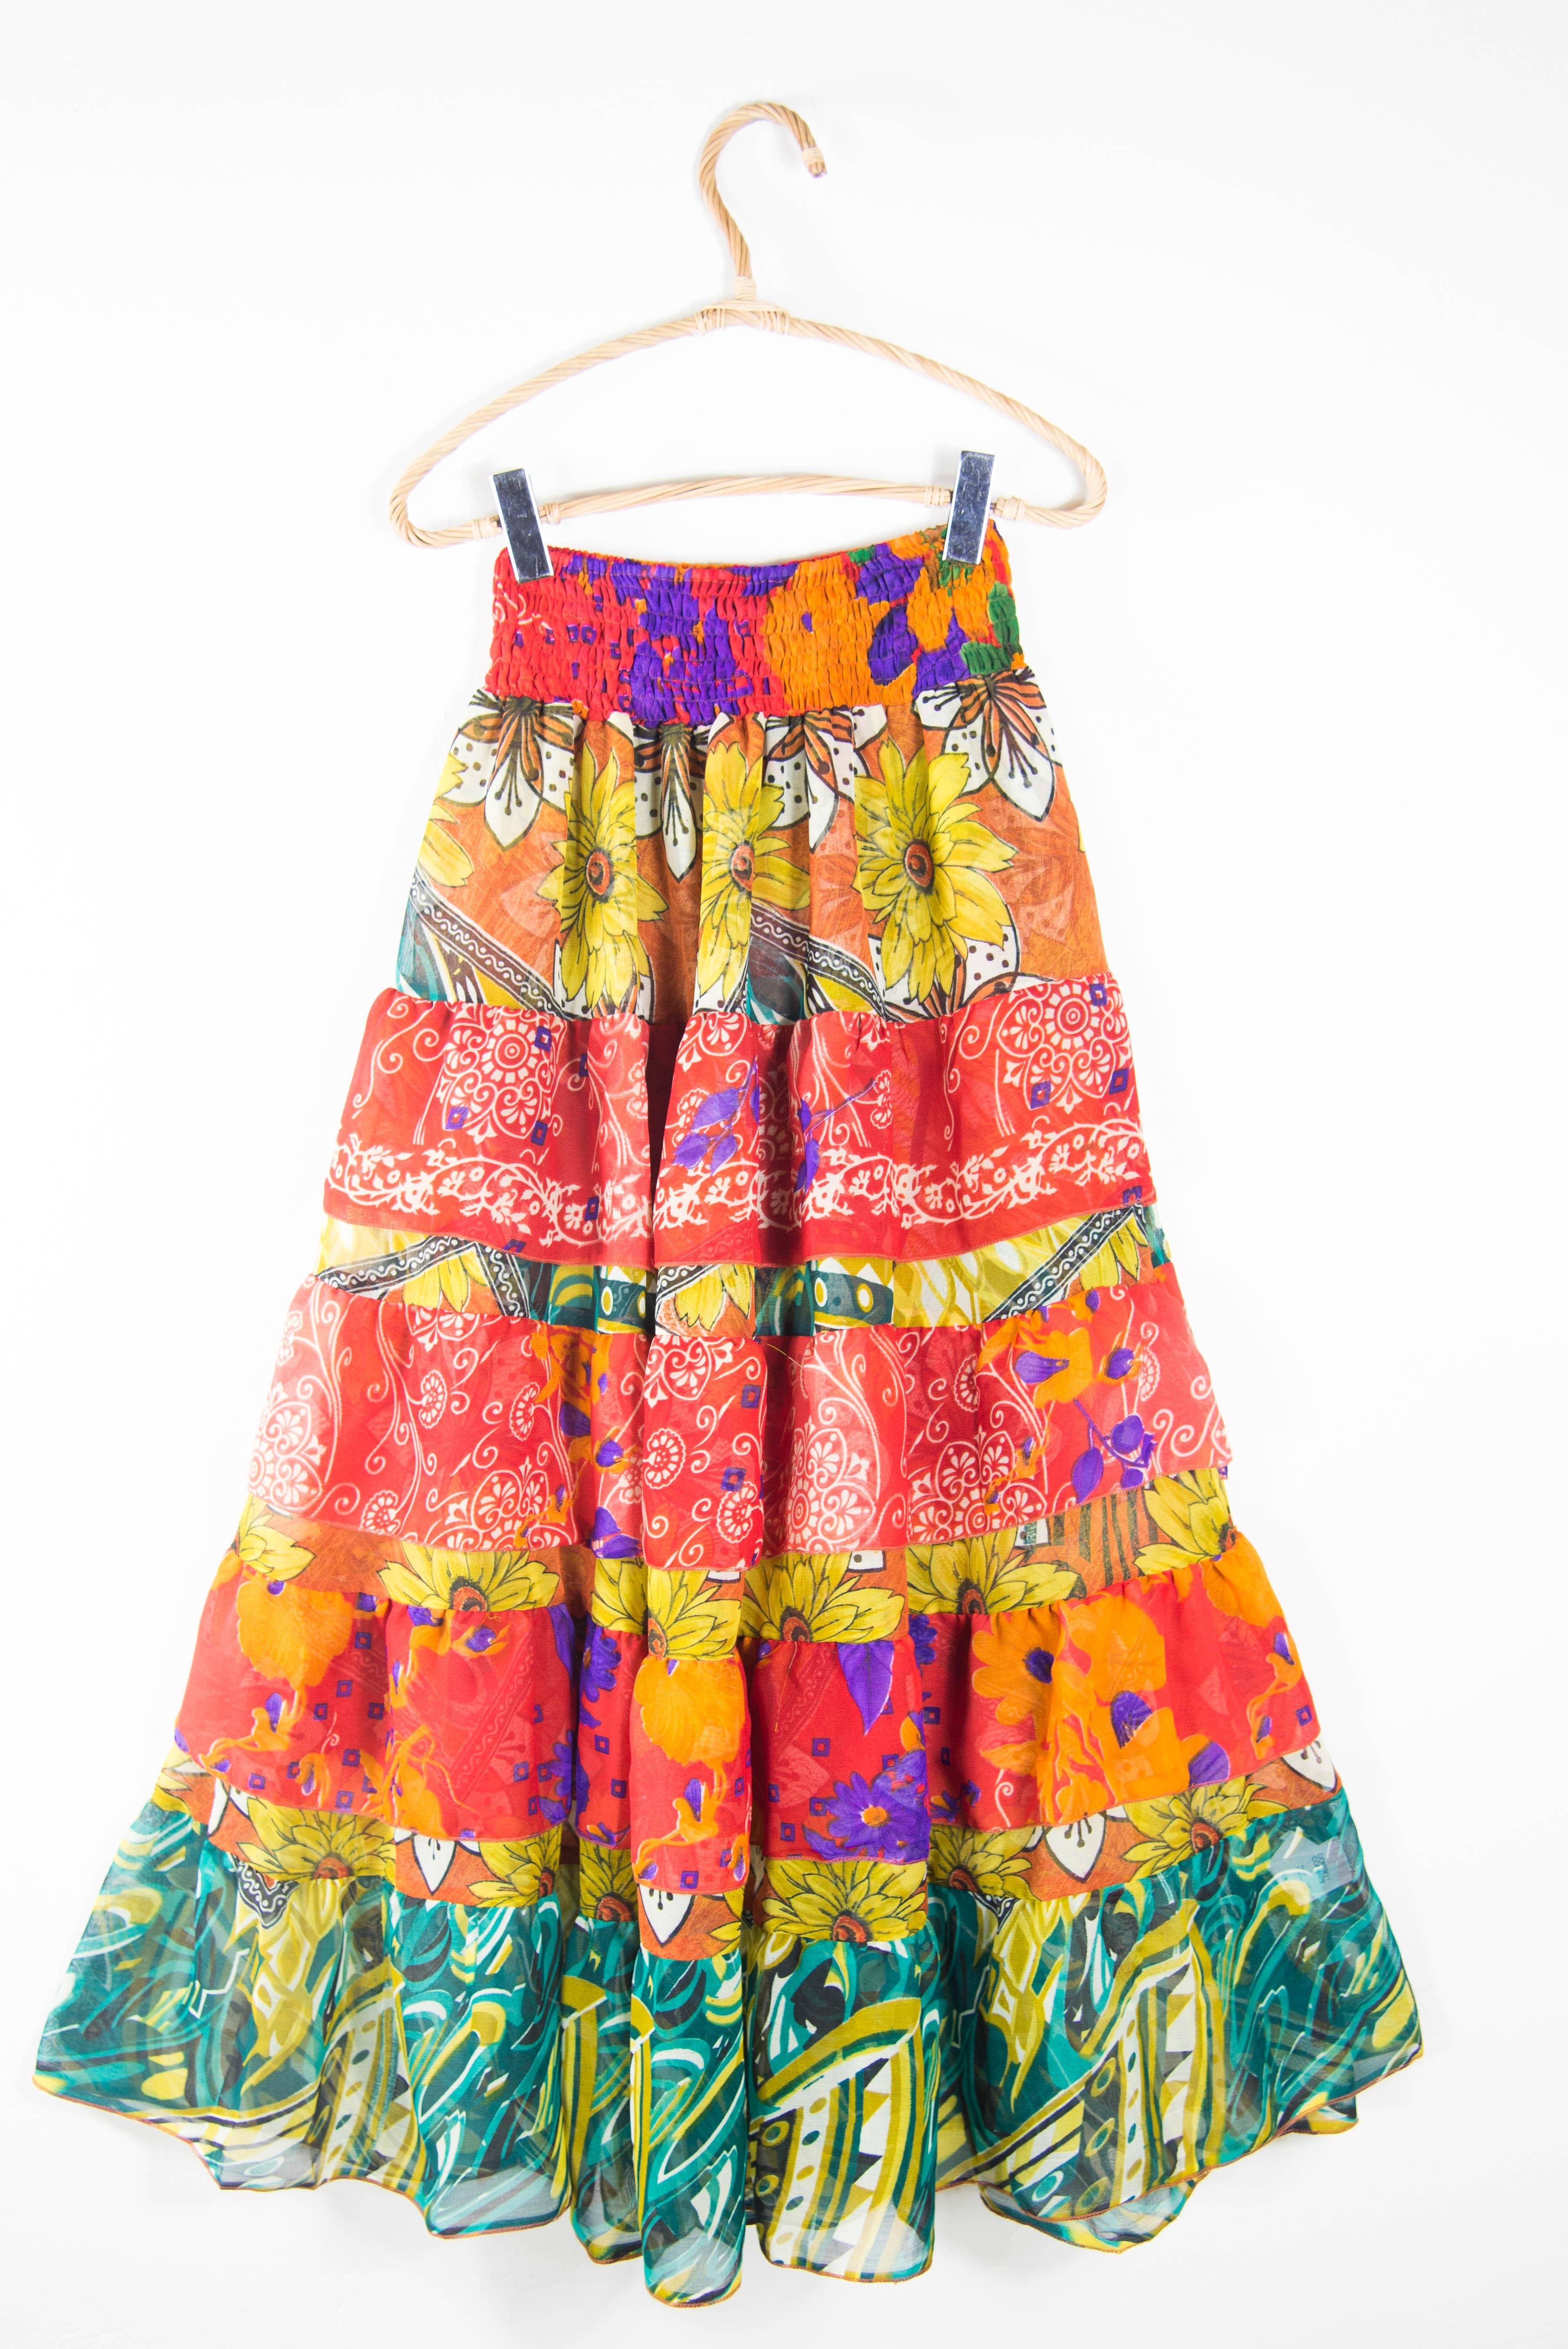 Ethnic style flounced skirt. Women's clothing online